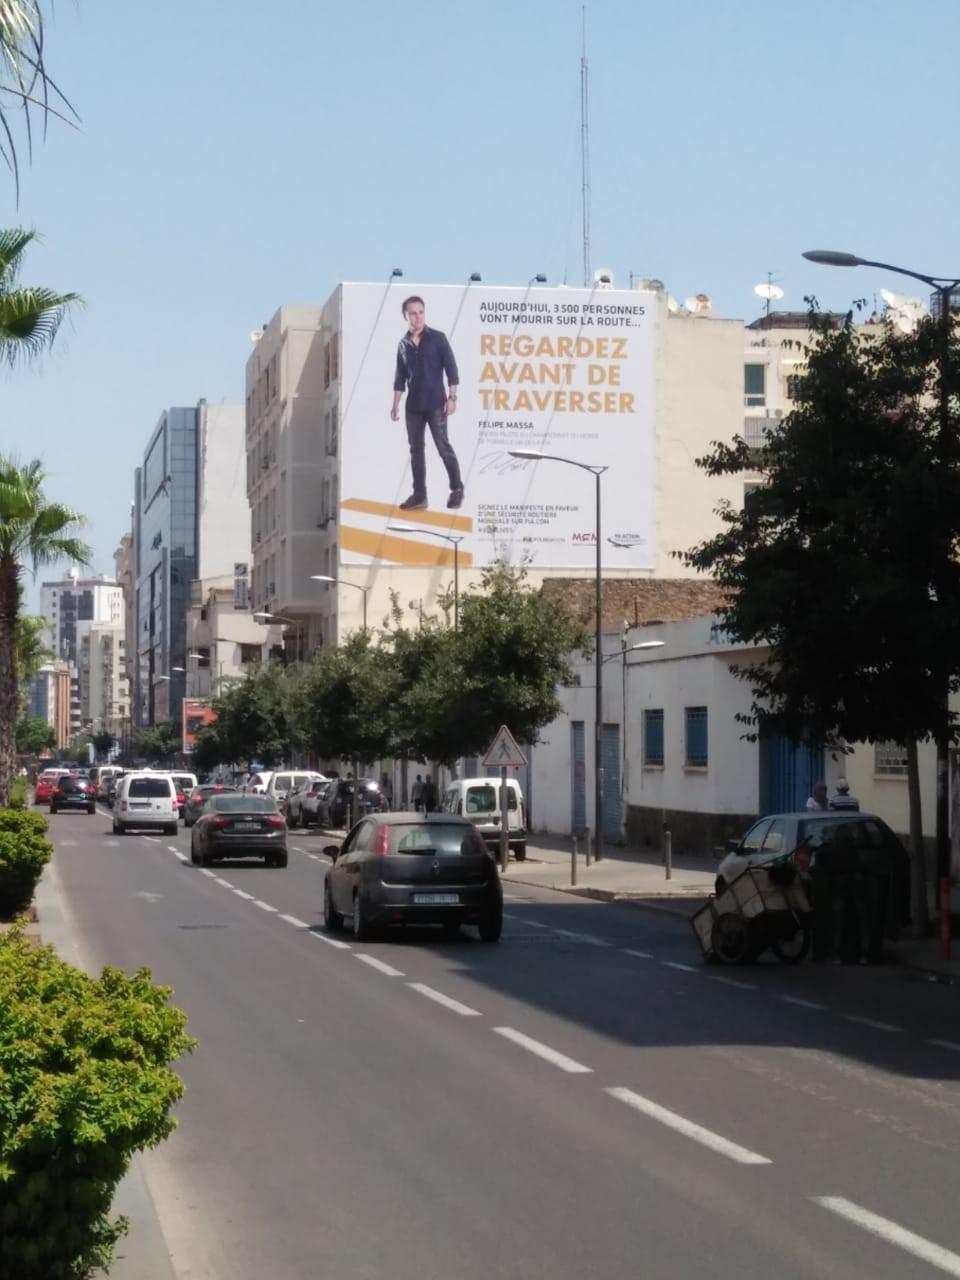 mobilite-club-maroc-deploie-la-campagne-mondiale-3500lives-a-casablanca-835-5.jpg